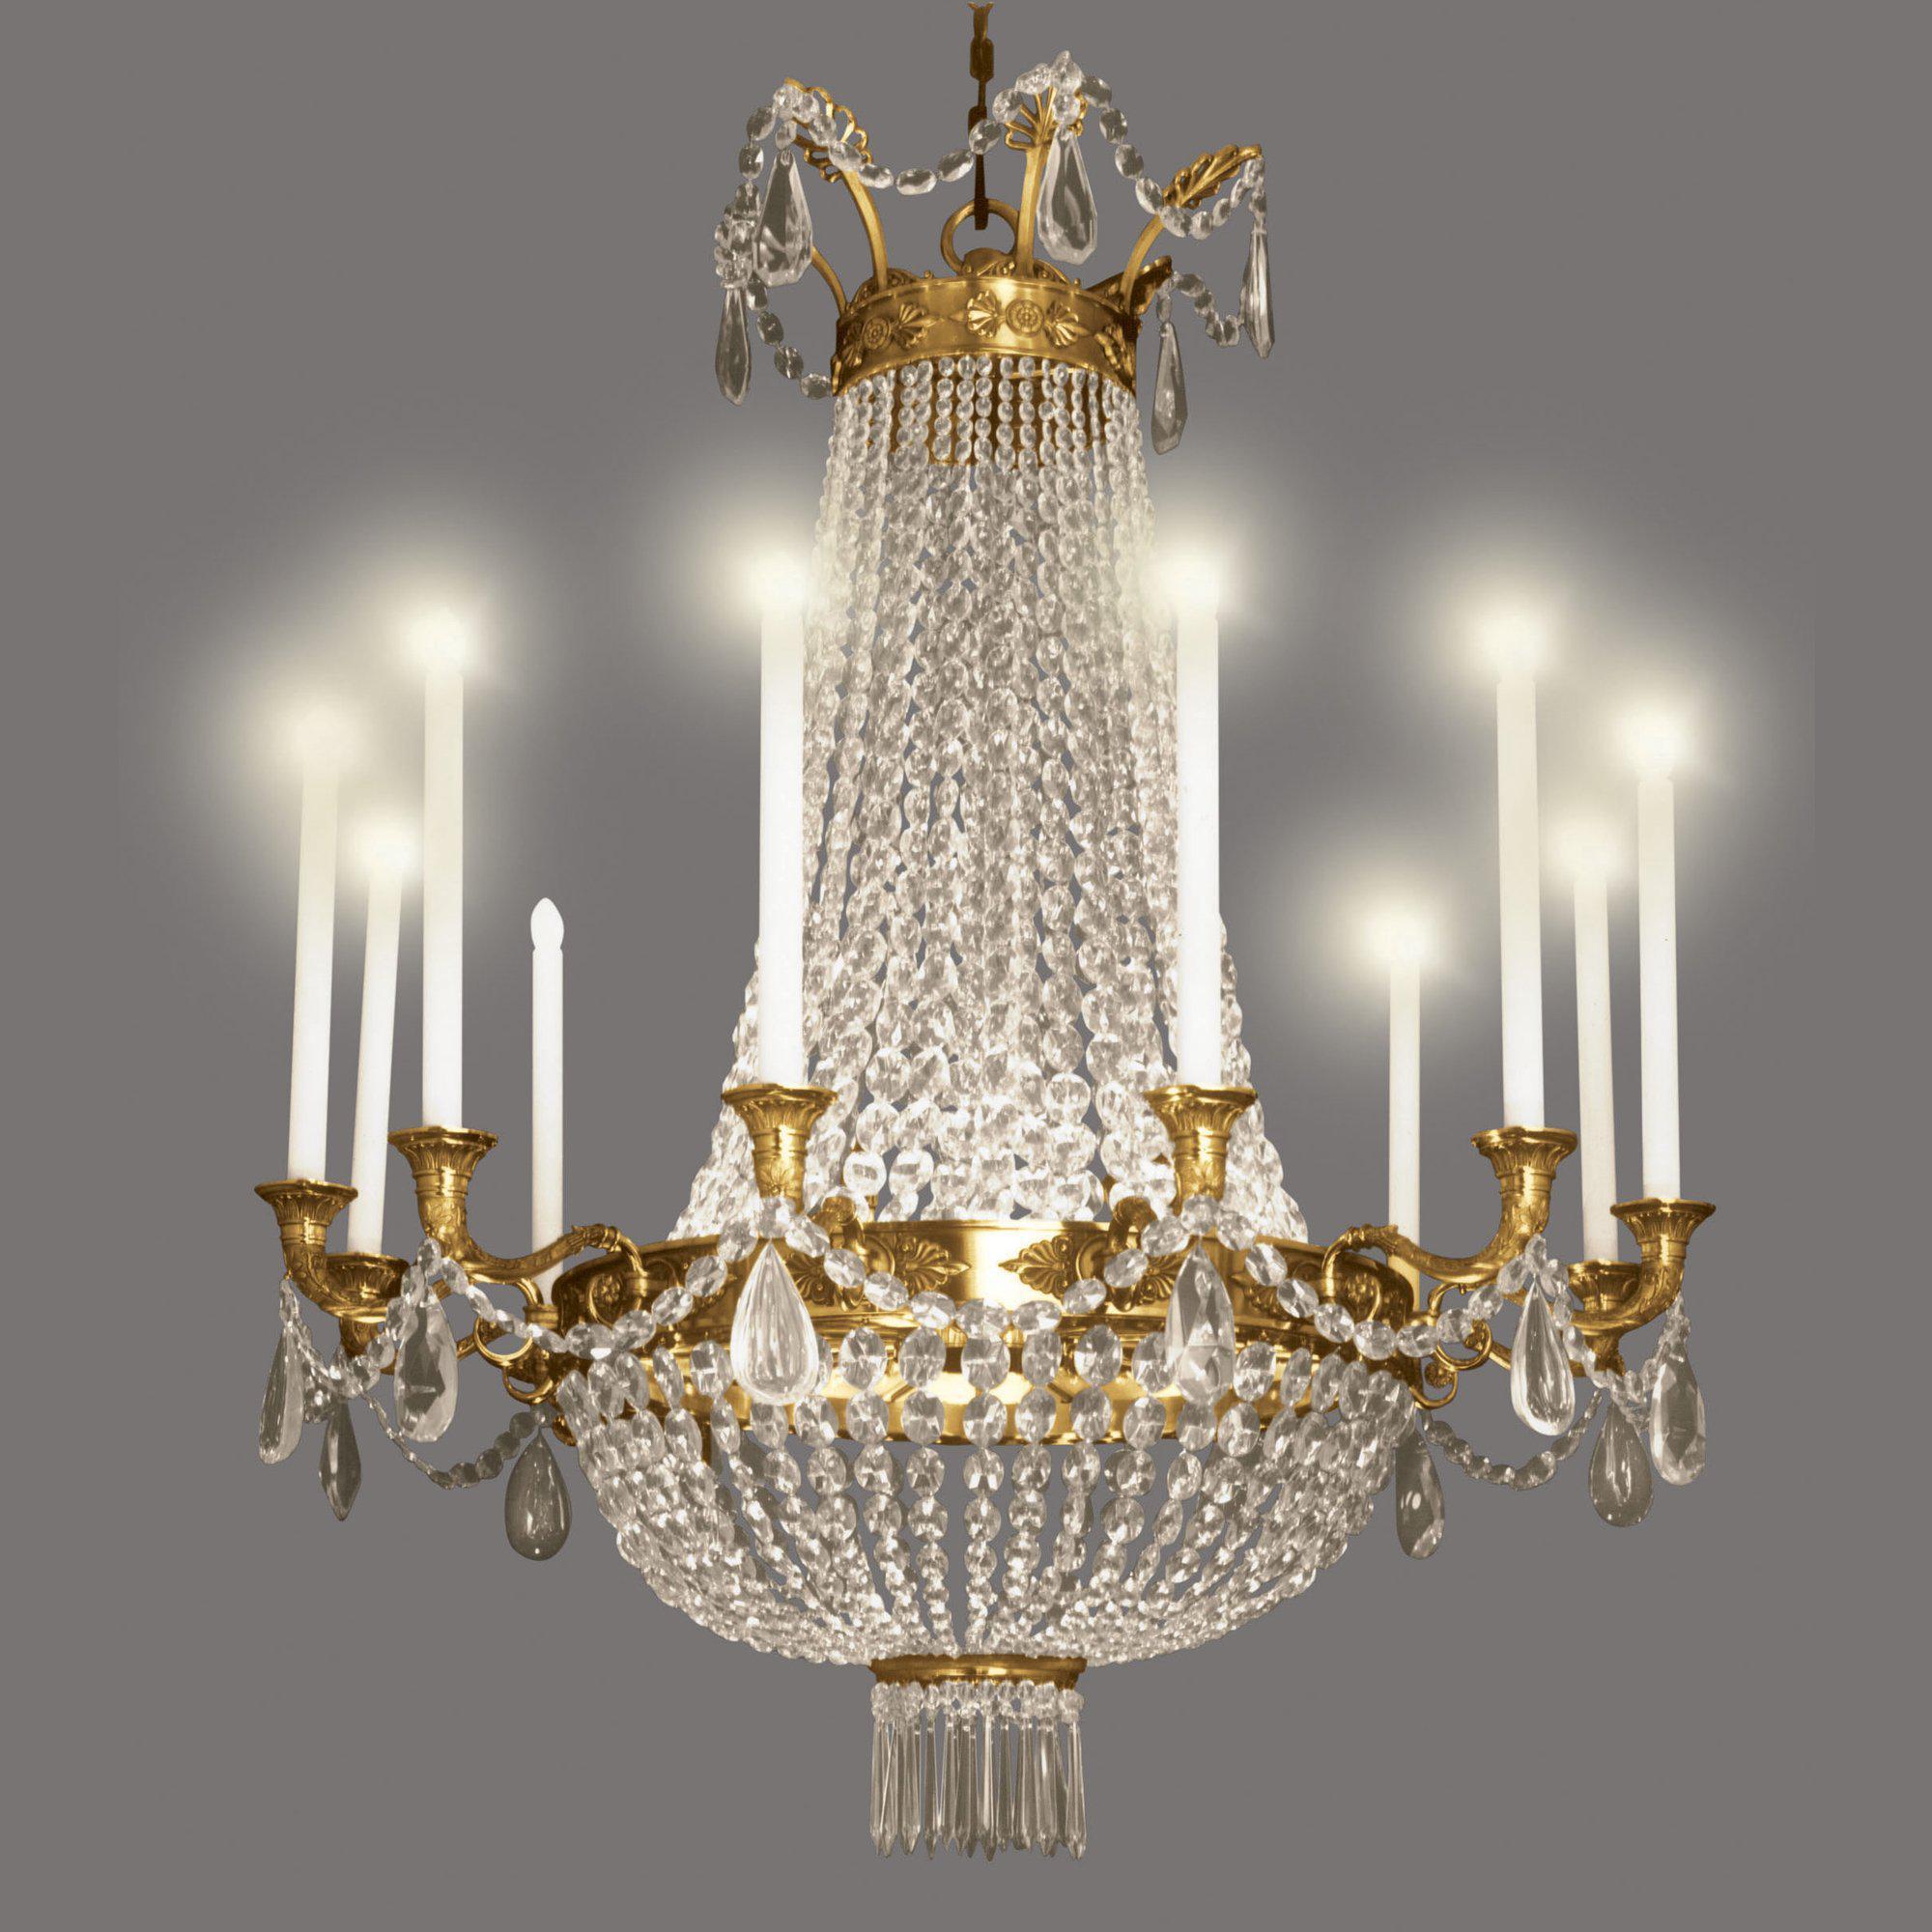 Charles X chandelier